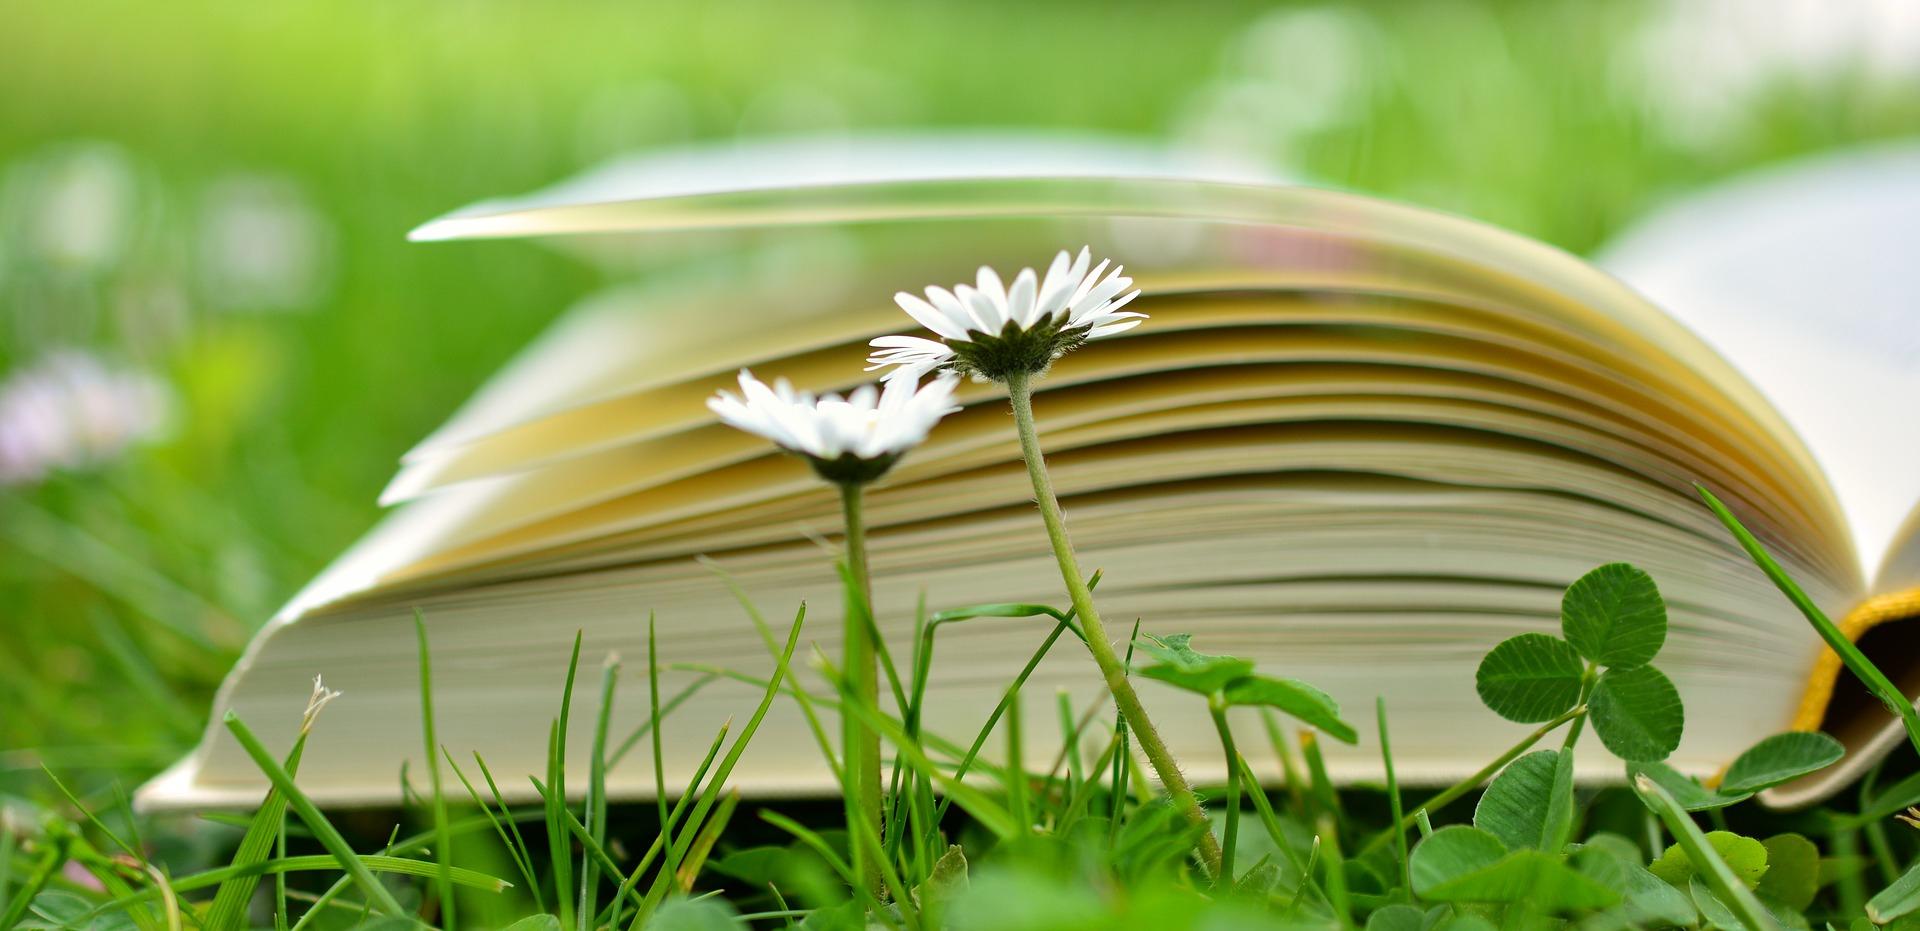 alternatif 100 temel eser, efkan doğan